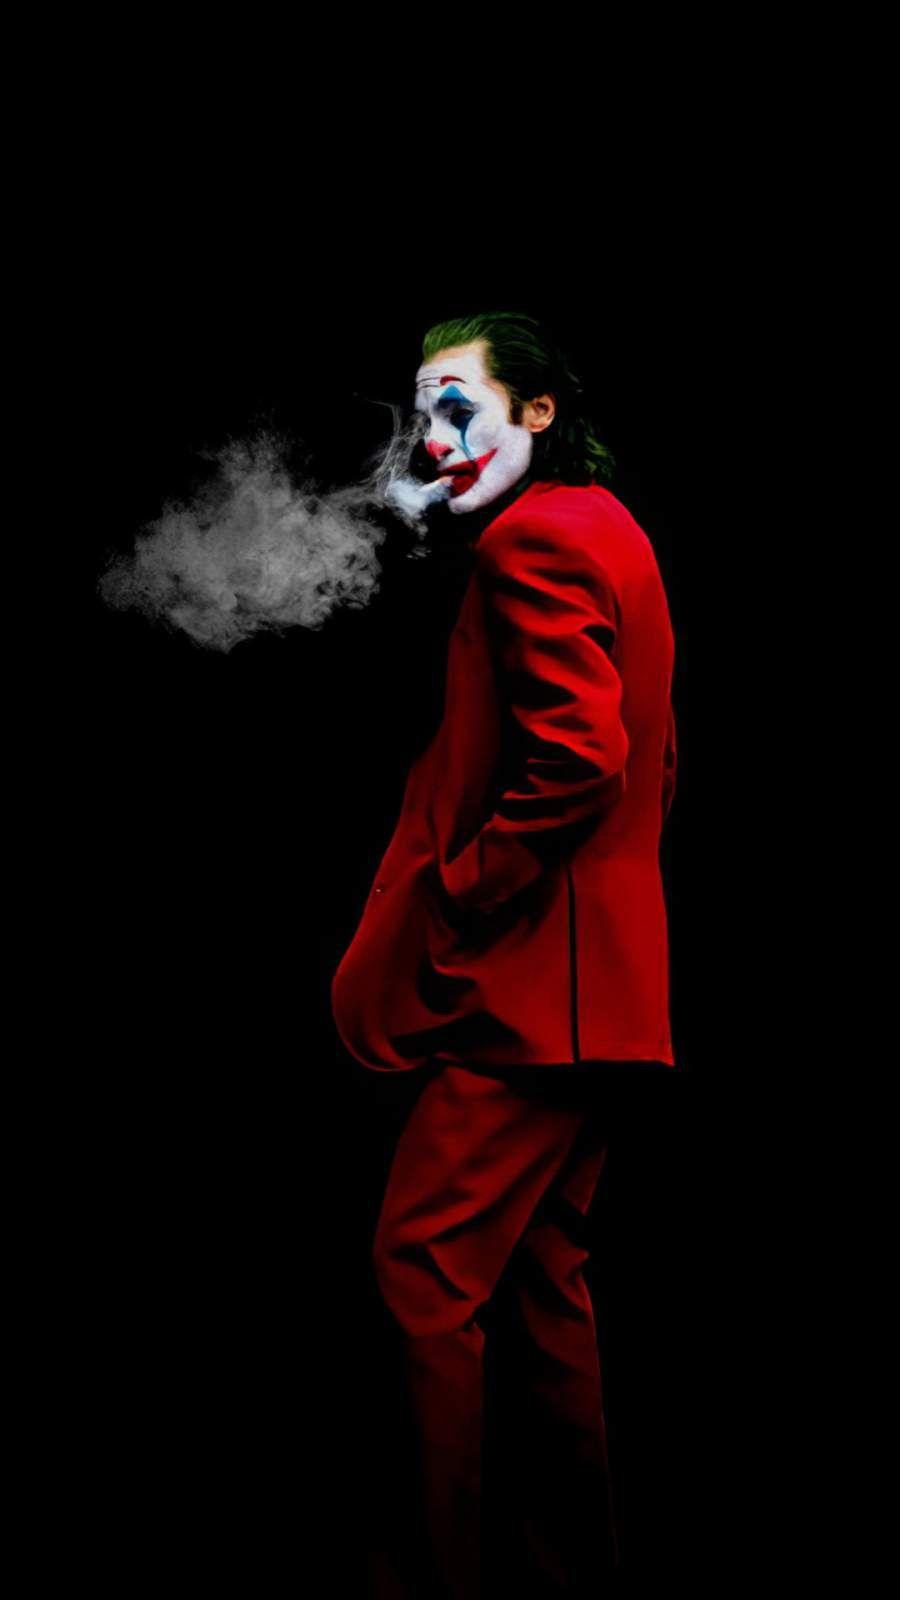 🔥 Bad Joker wallpaper Full Ultra 4k HD ...